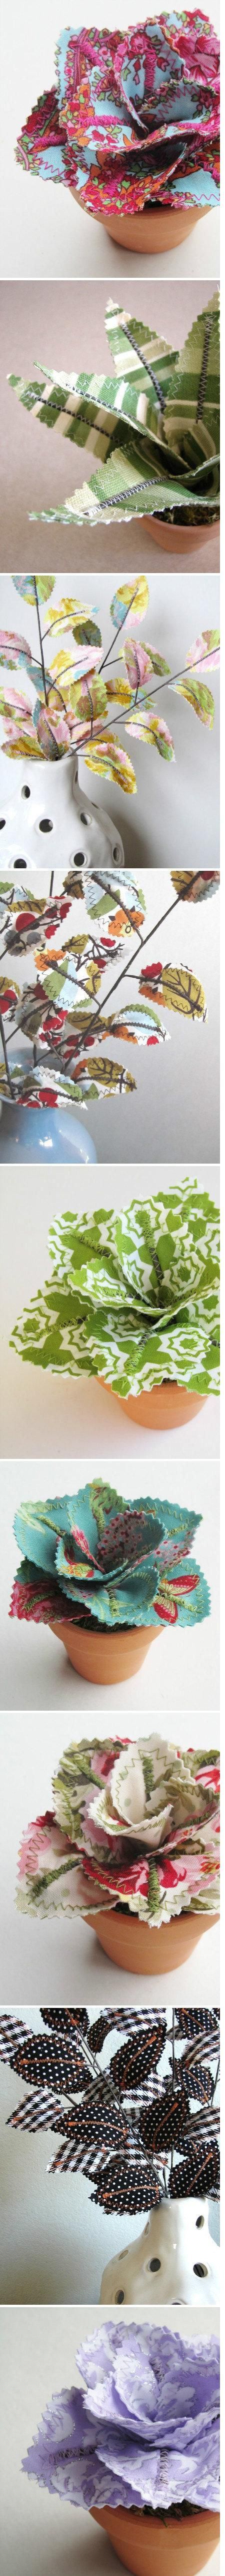 fabric plants